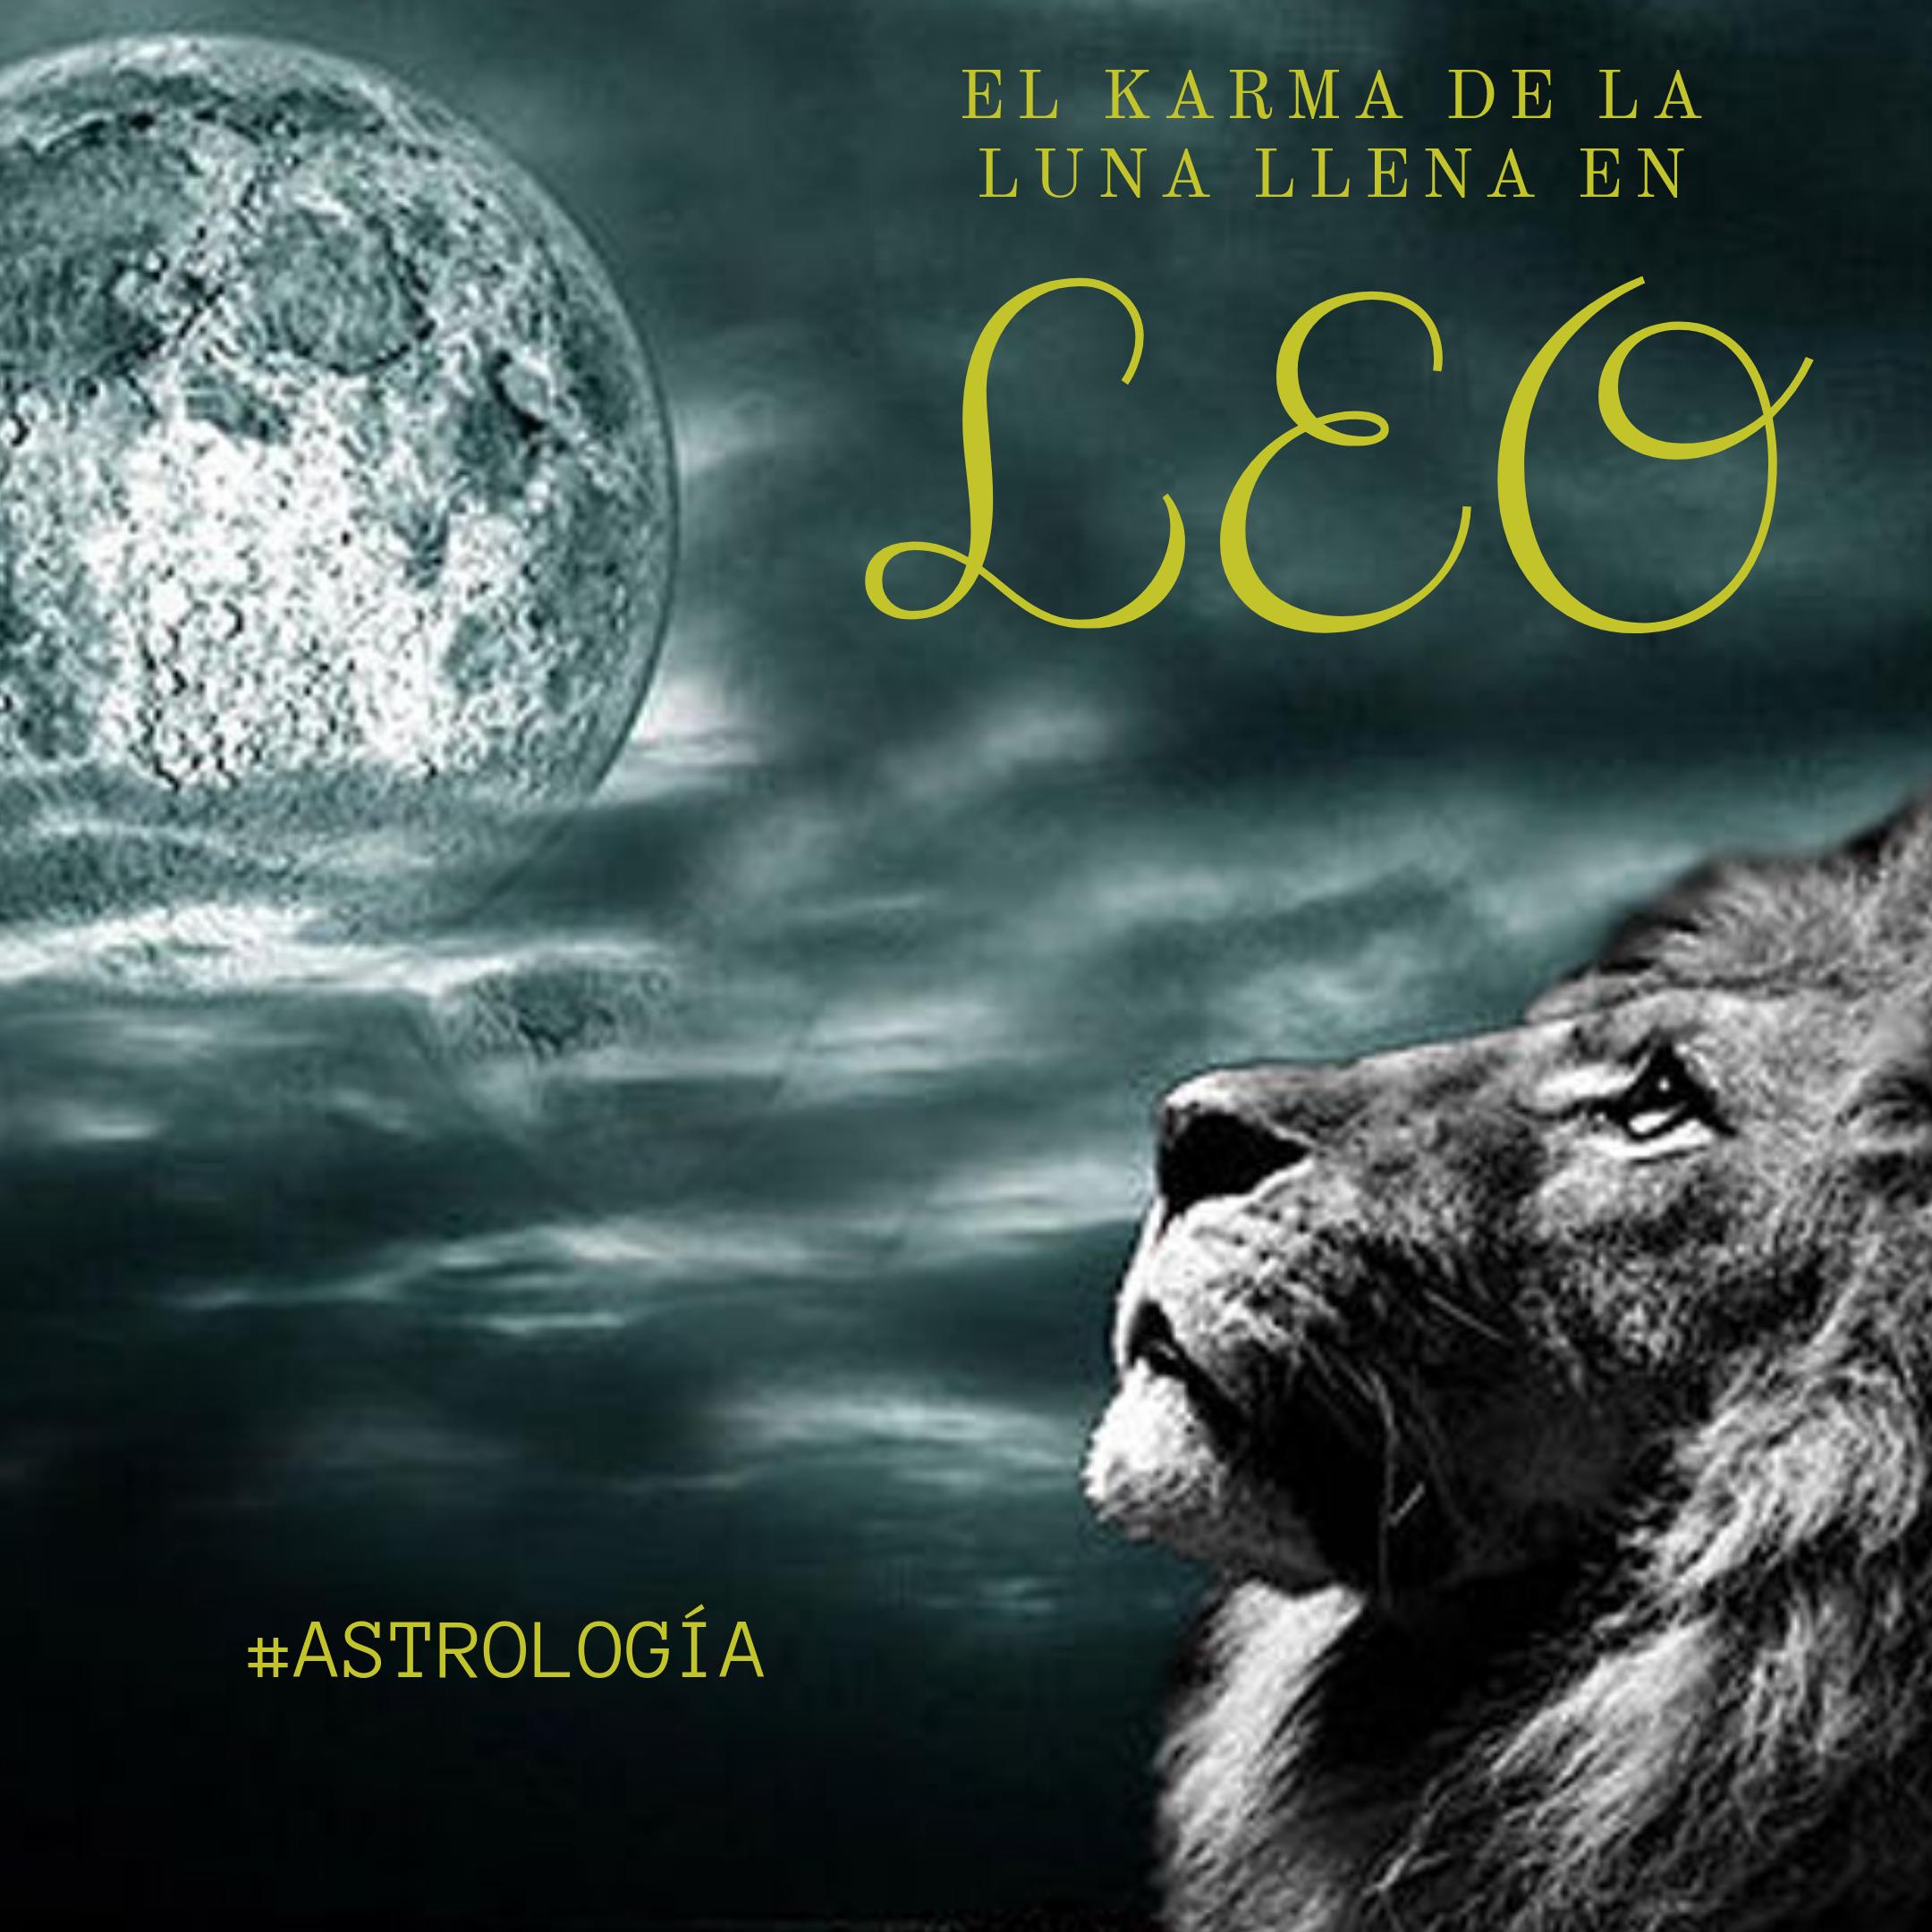 EL karma de la luna llena en Leo